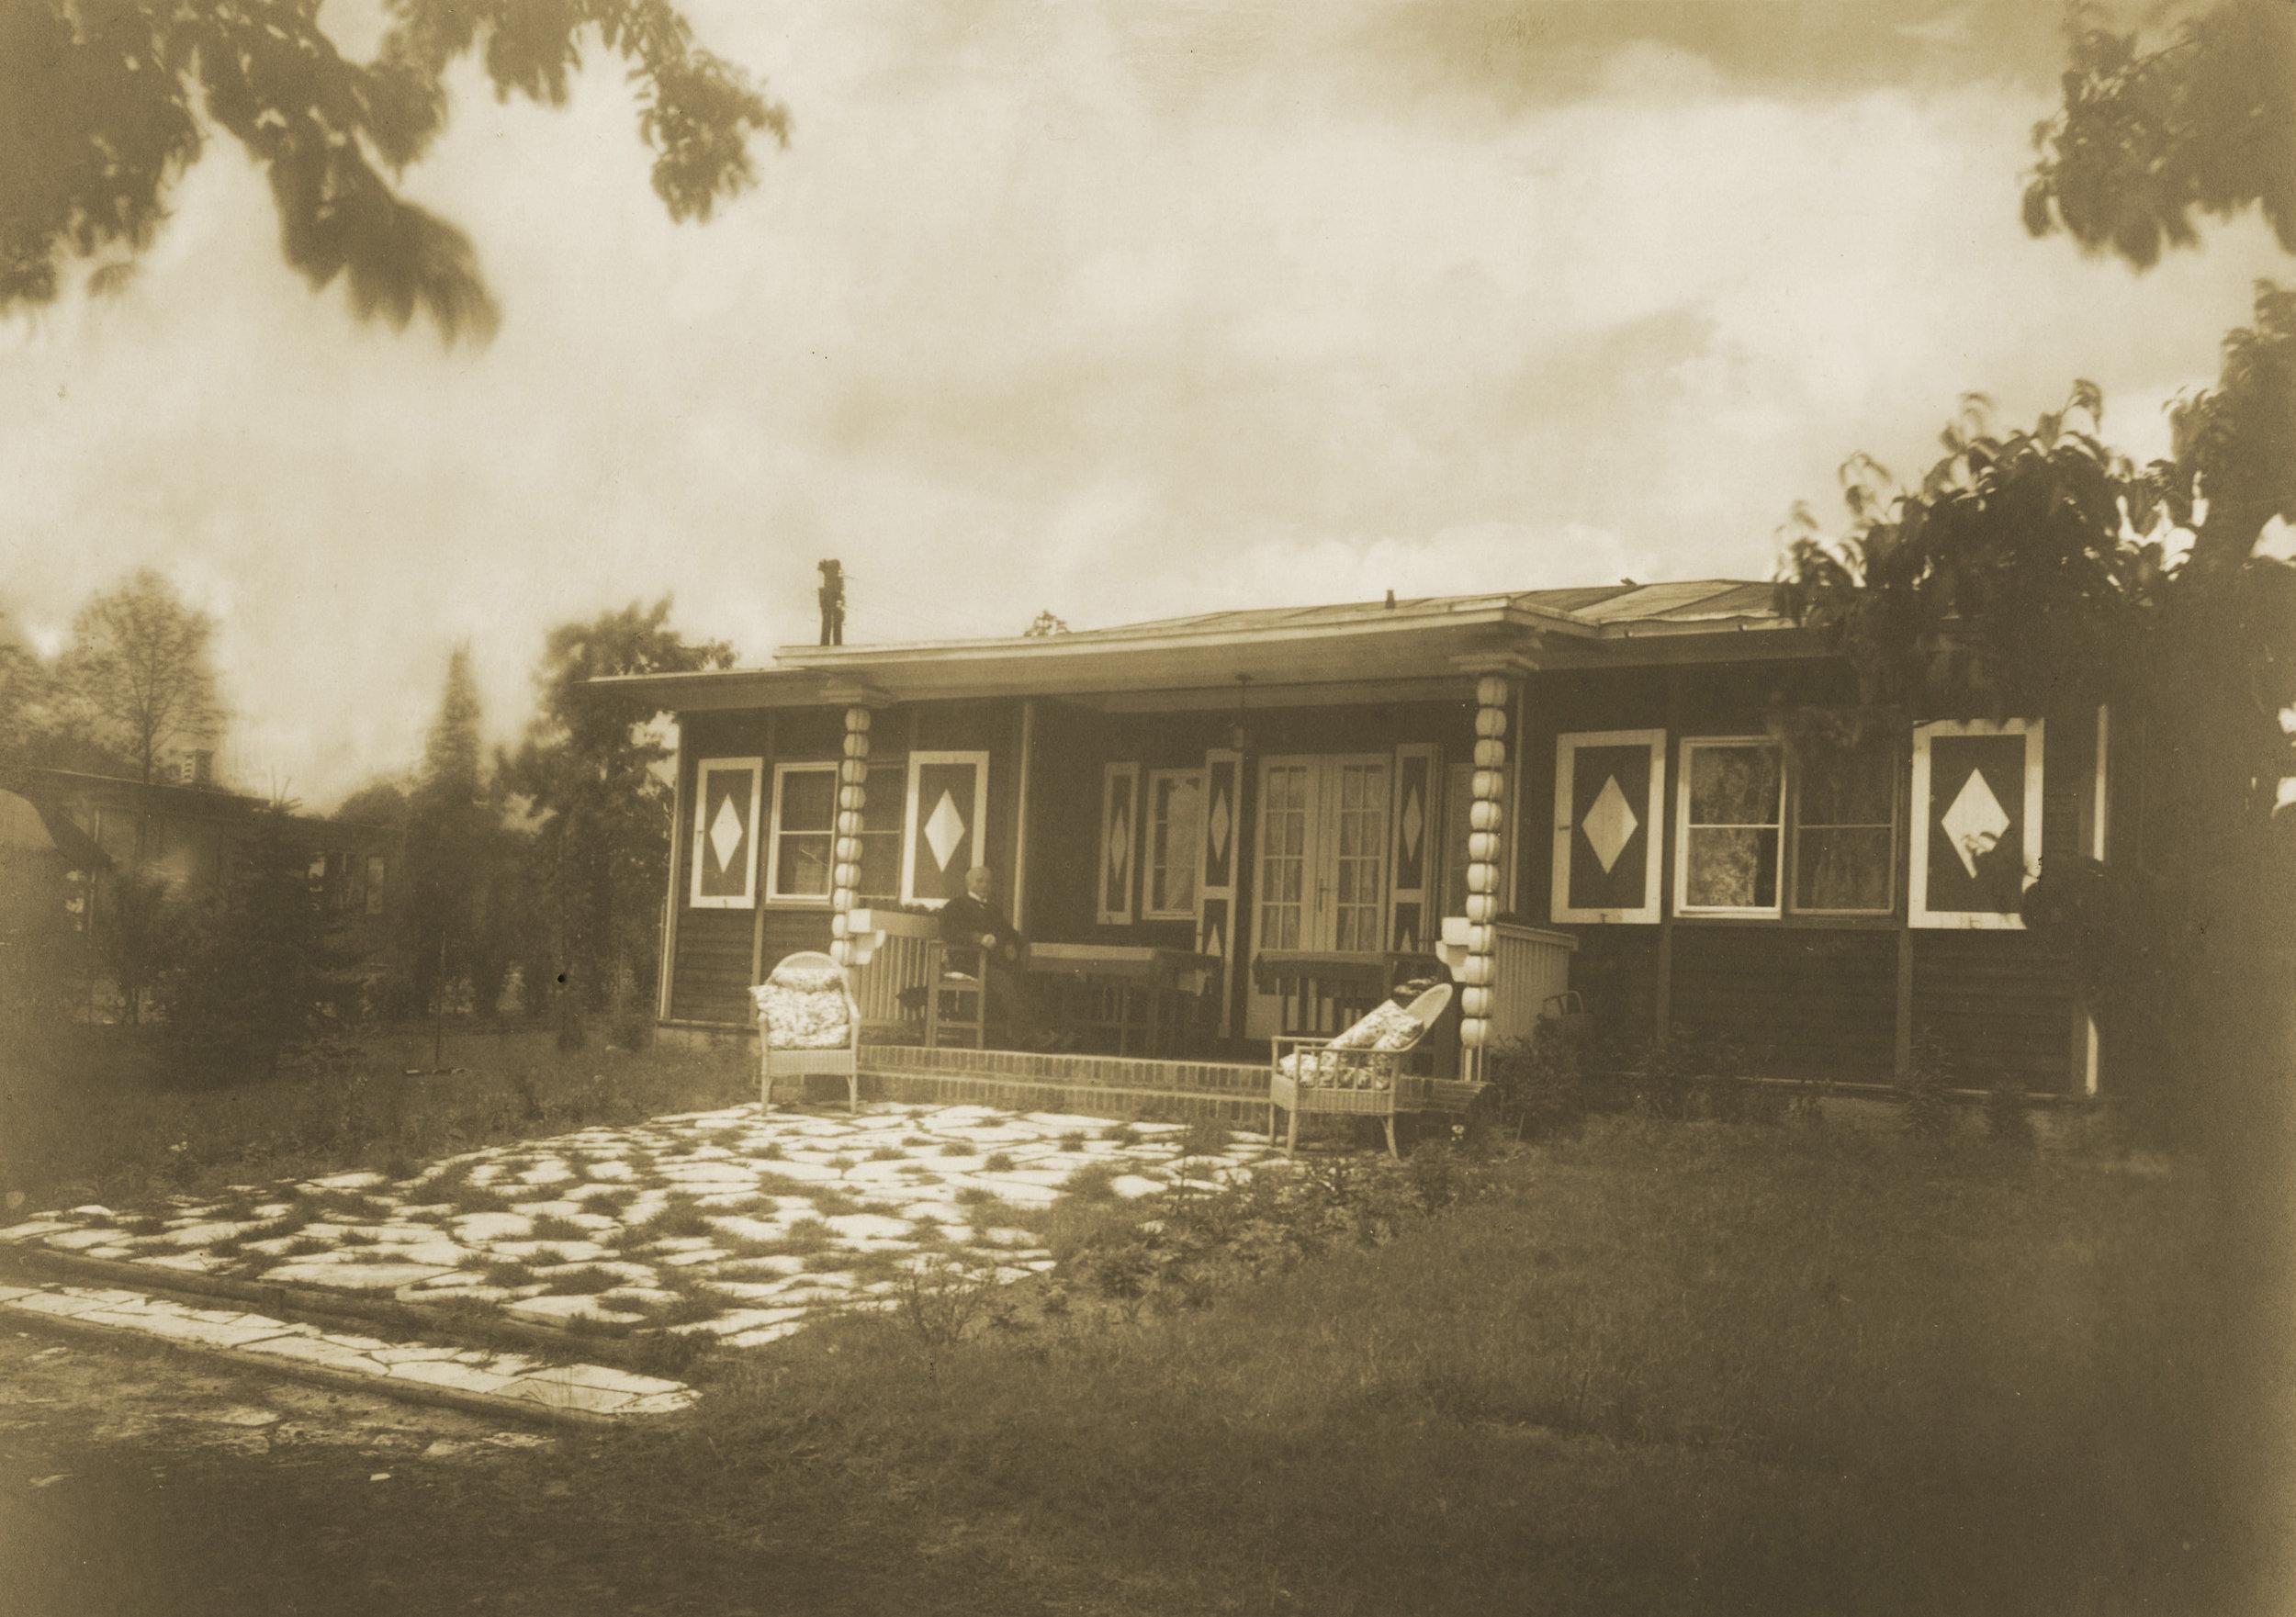 Alexander Haus 1928 Lotte Jakobi.jpg